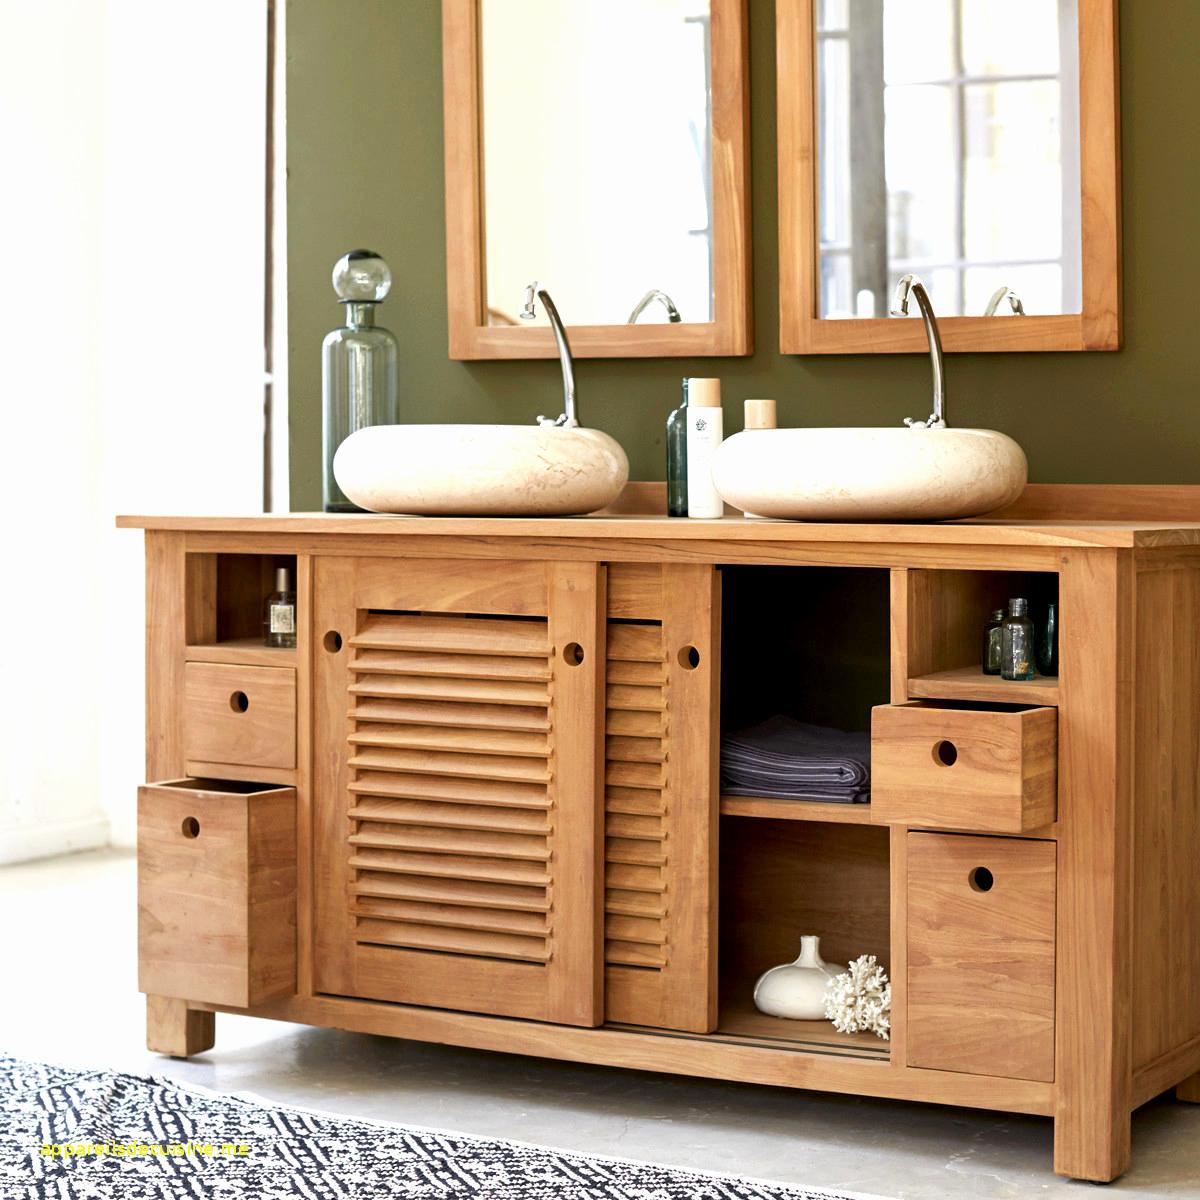 Ikea Meuble Double Vasque Frais Collection Ikea Double Vasque Beau Meuble Double Vasque 100 Cm Ikea Archives